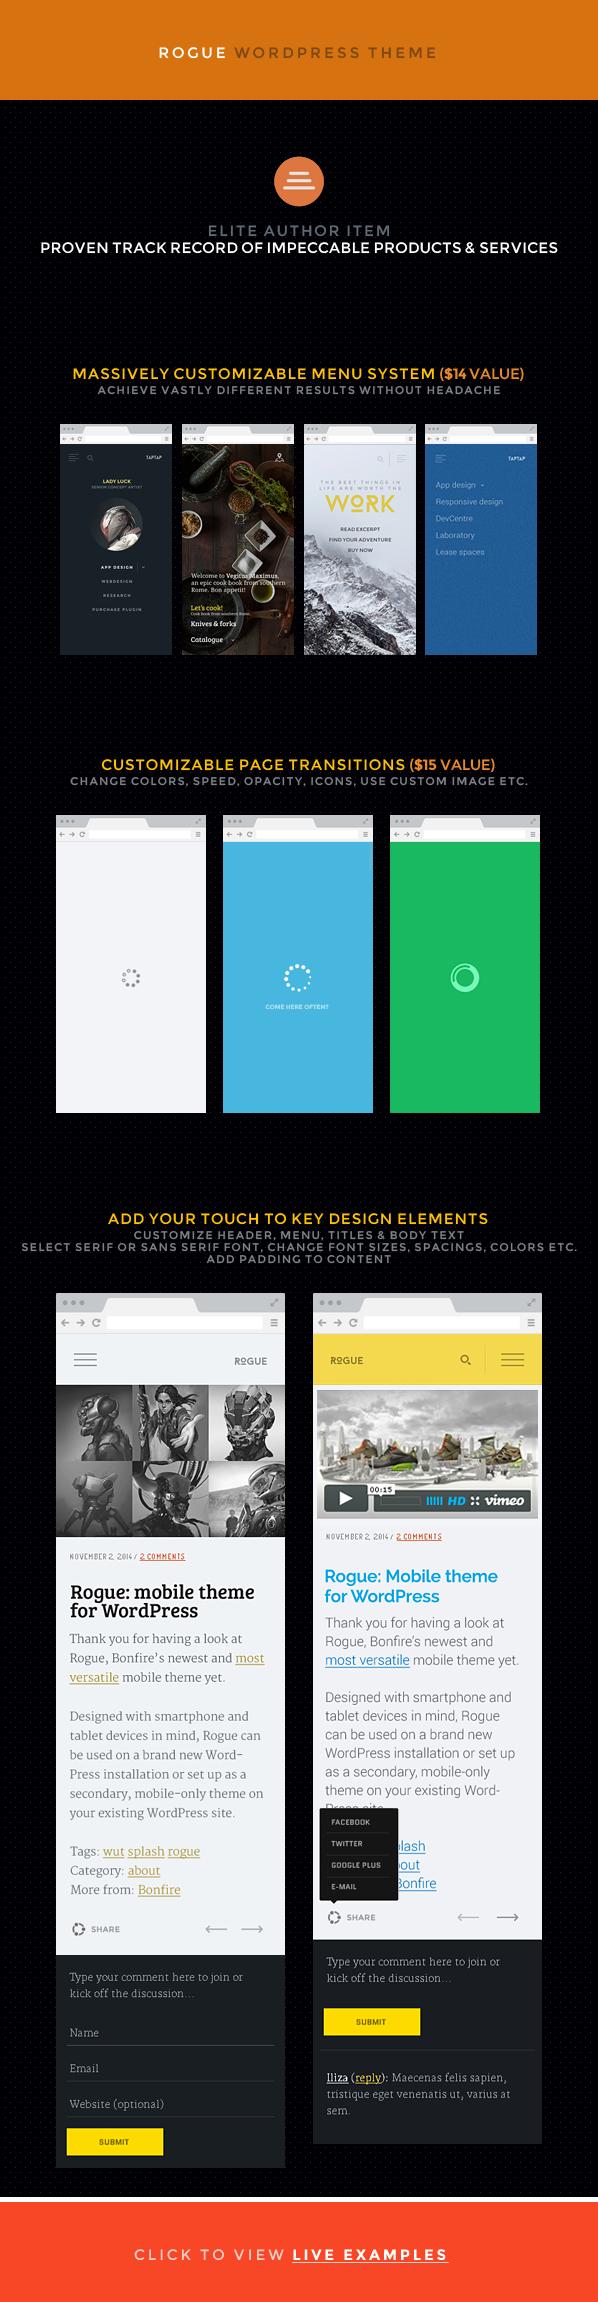 Rogue: Customizable Mobile Theme for WordPress - 4